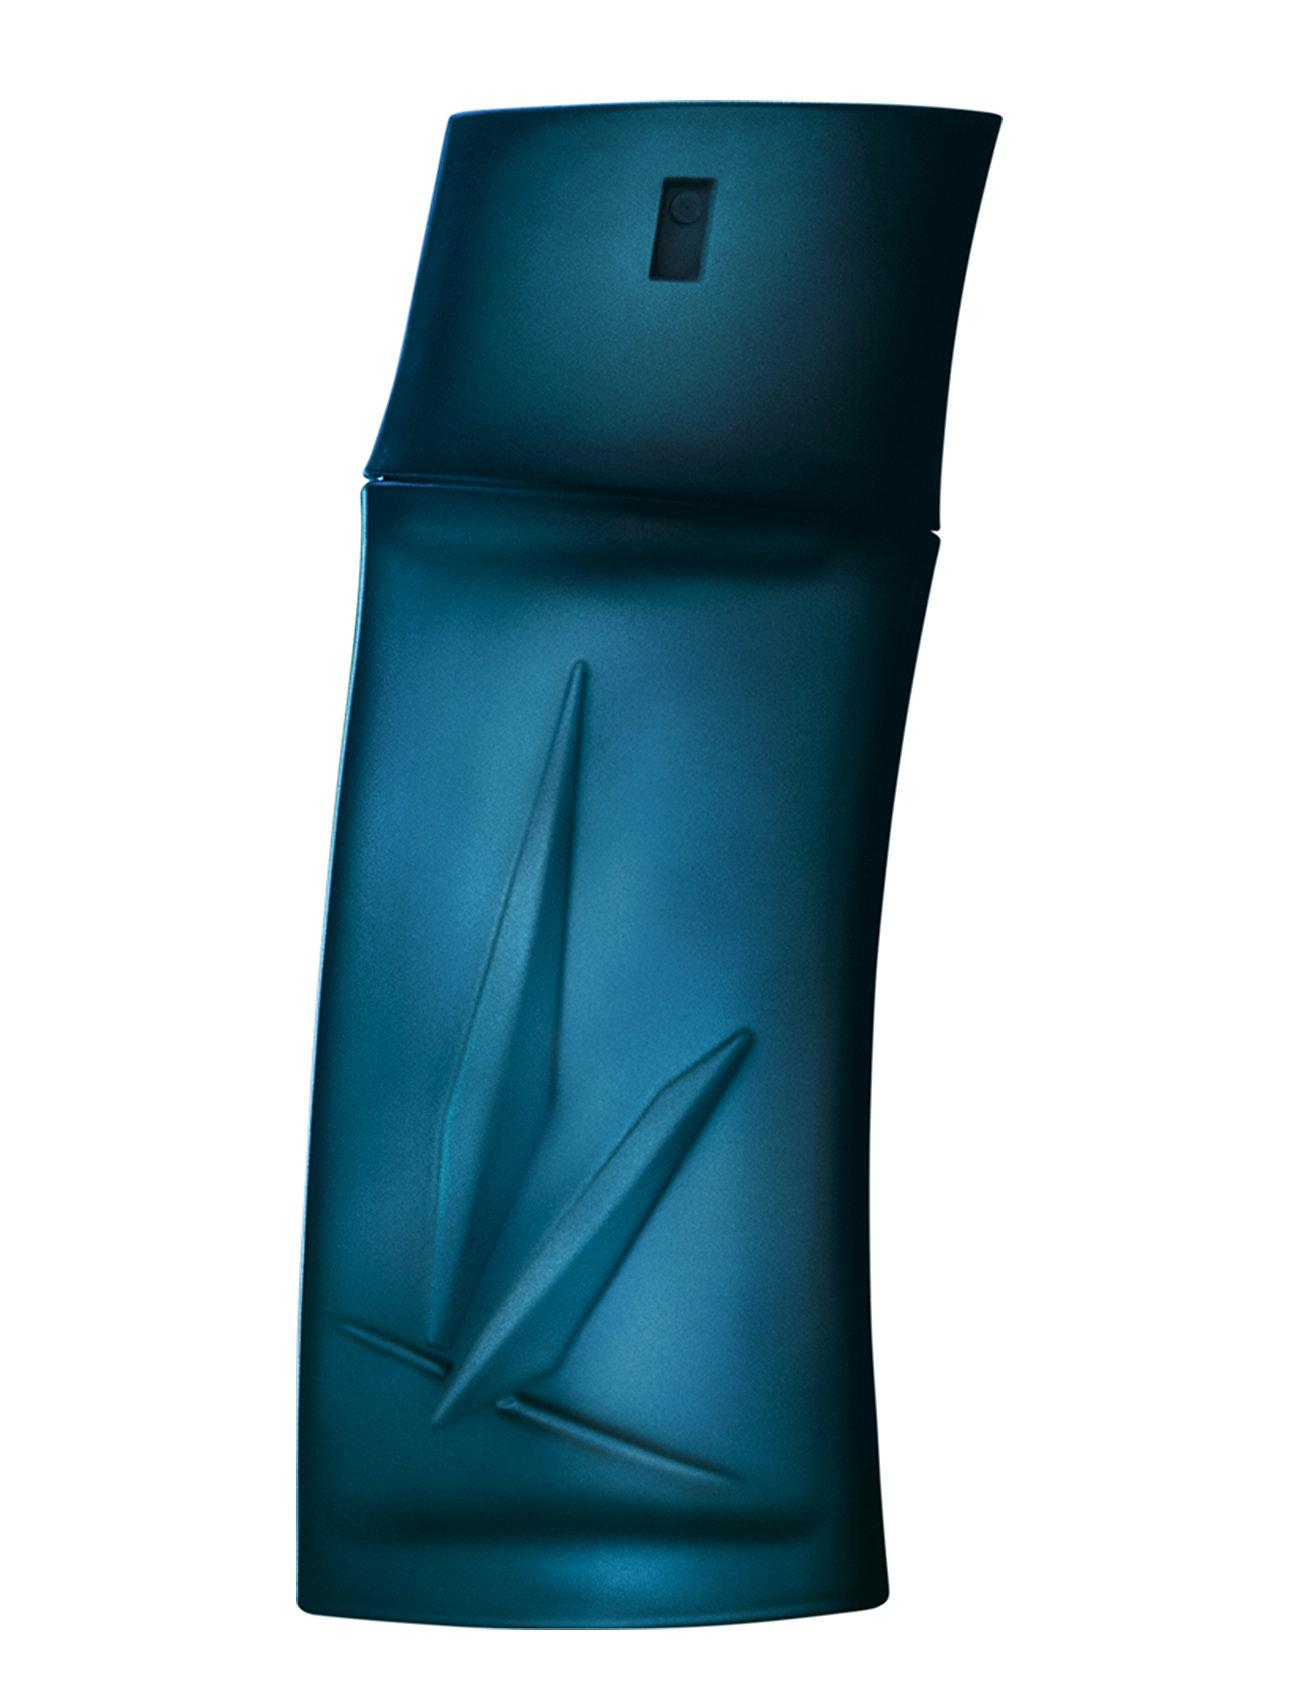 Kenzo Kenzo Homme Eau De Toilette Kenzo Fragrance #I/T til Mænd i